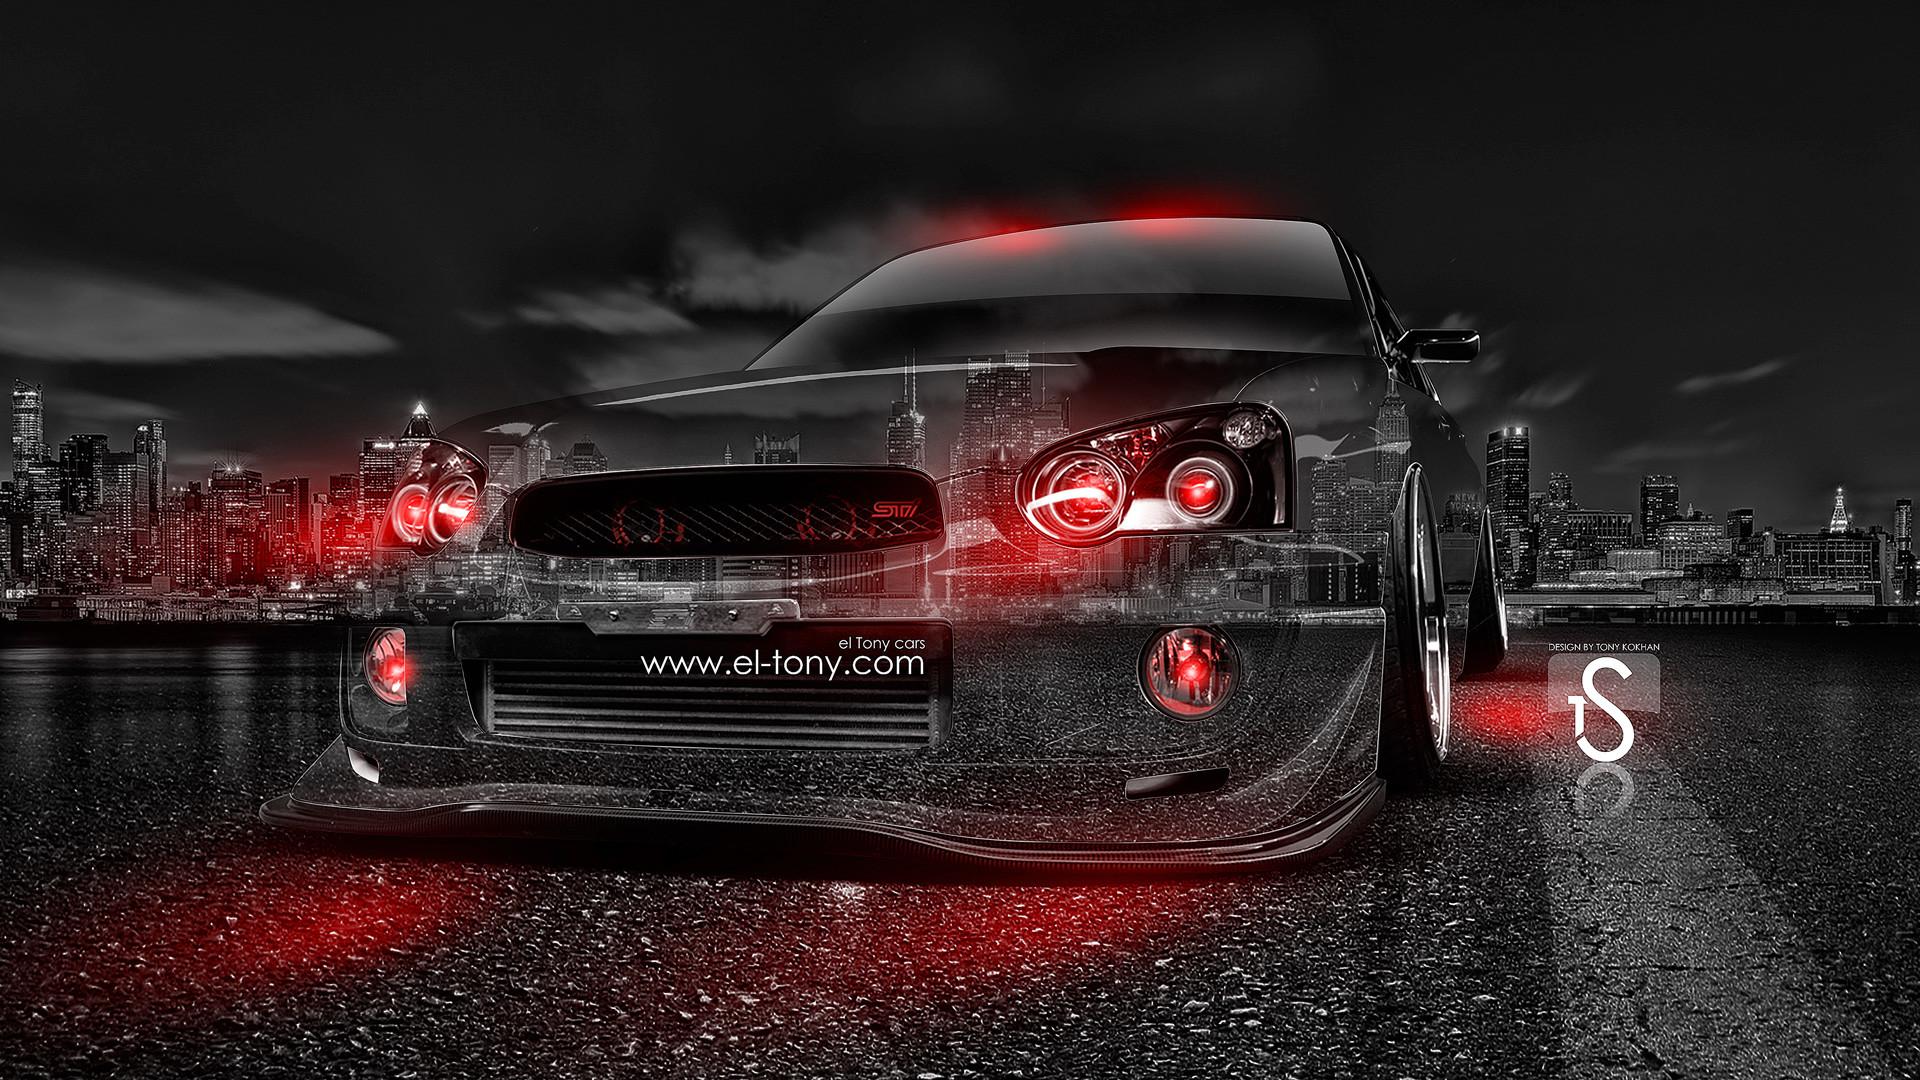 Subaru WRX STI JDM Crystal City Car 2014 | el Tony